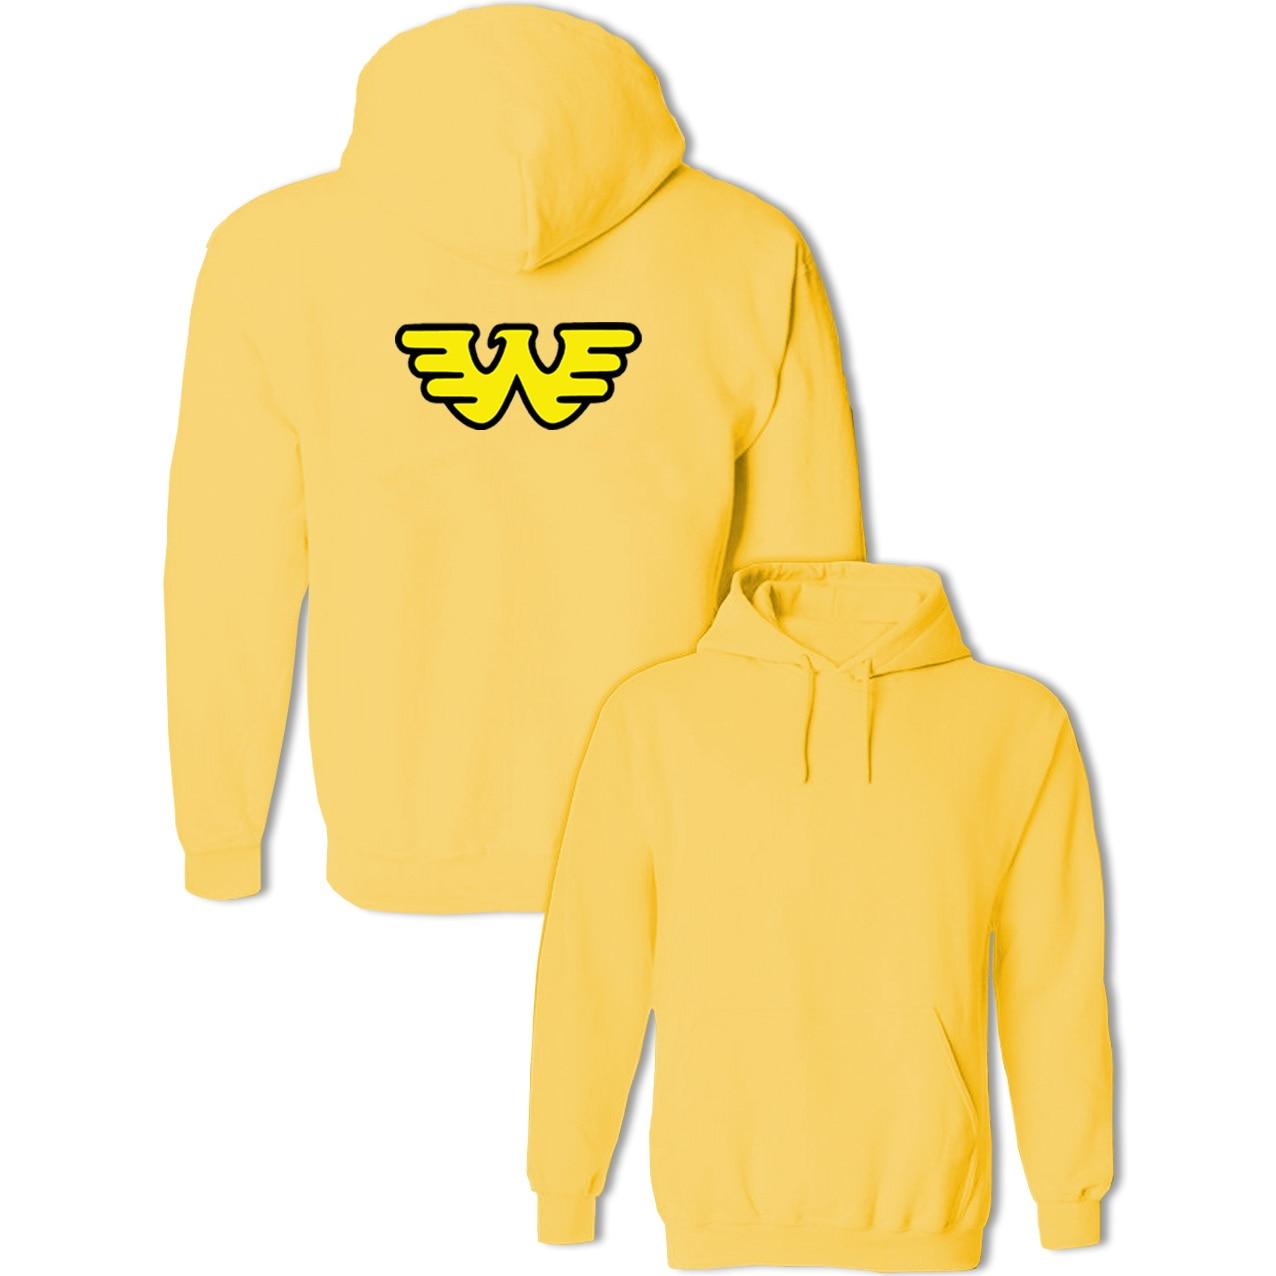 Waylon Jennings Flying Design Hoodies Anime Unisex Mens Womens Girls Boys Sweatshirts Spring Autumn Early Winter Pullovers